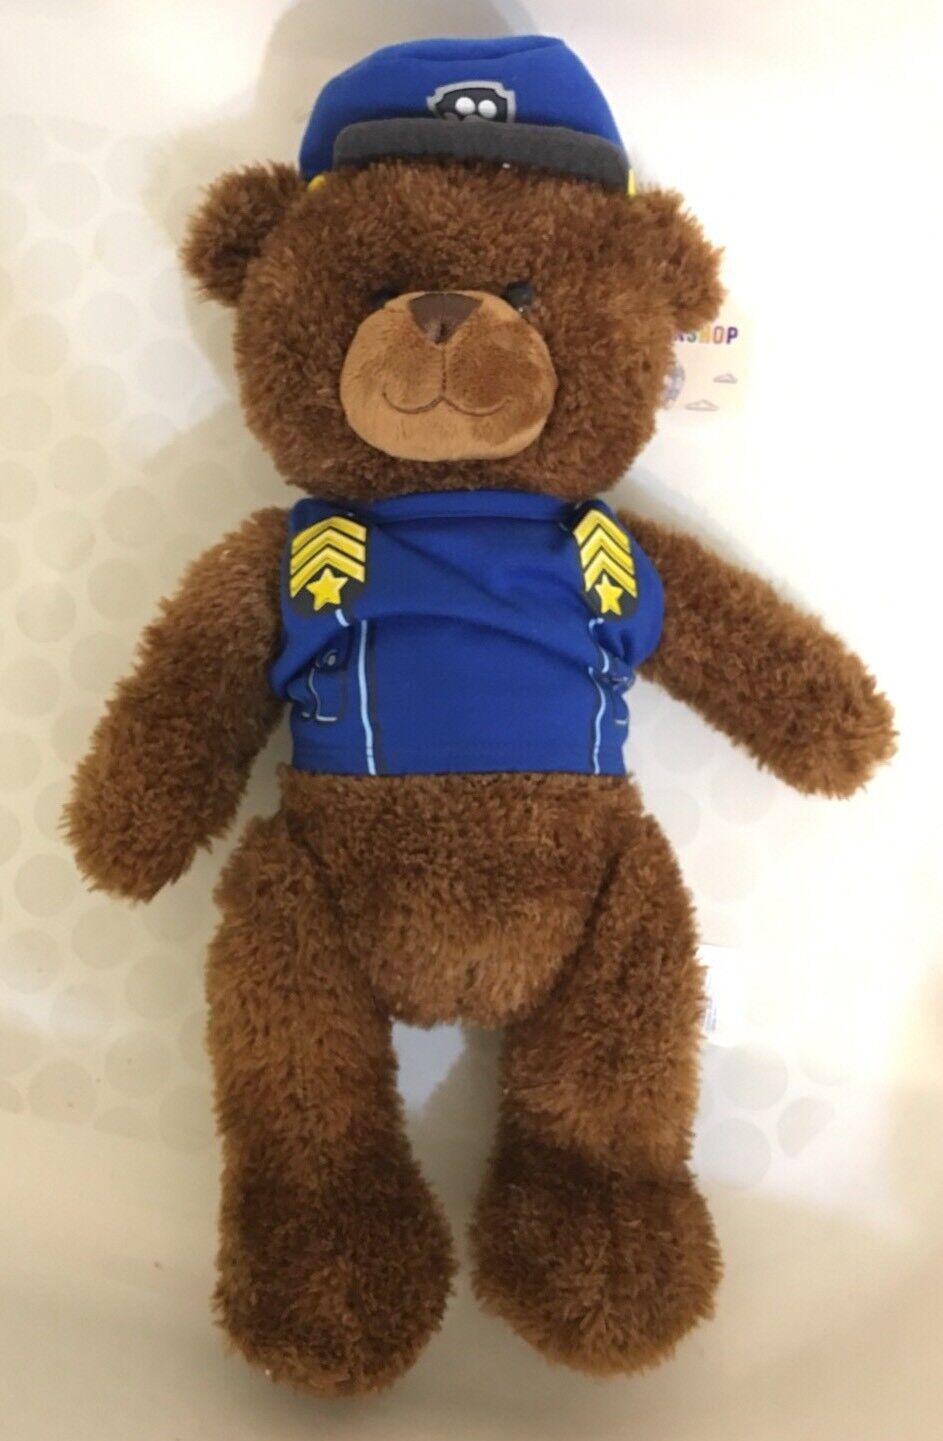 Build A Bear Workshop Traditional Teddy Bear Cocoa marrone Police Uniform, Hat 18